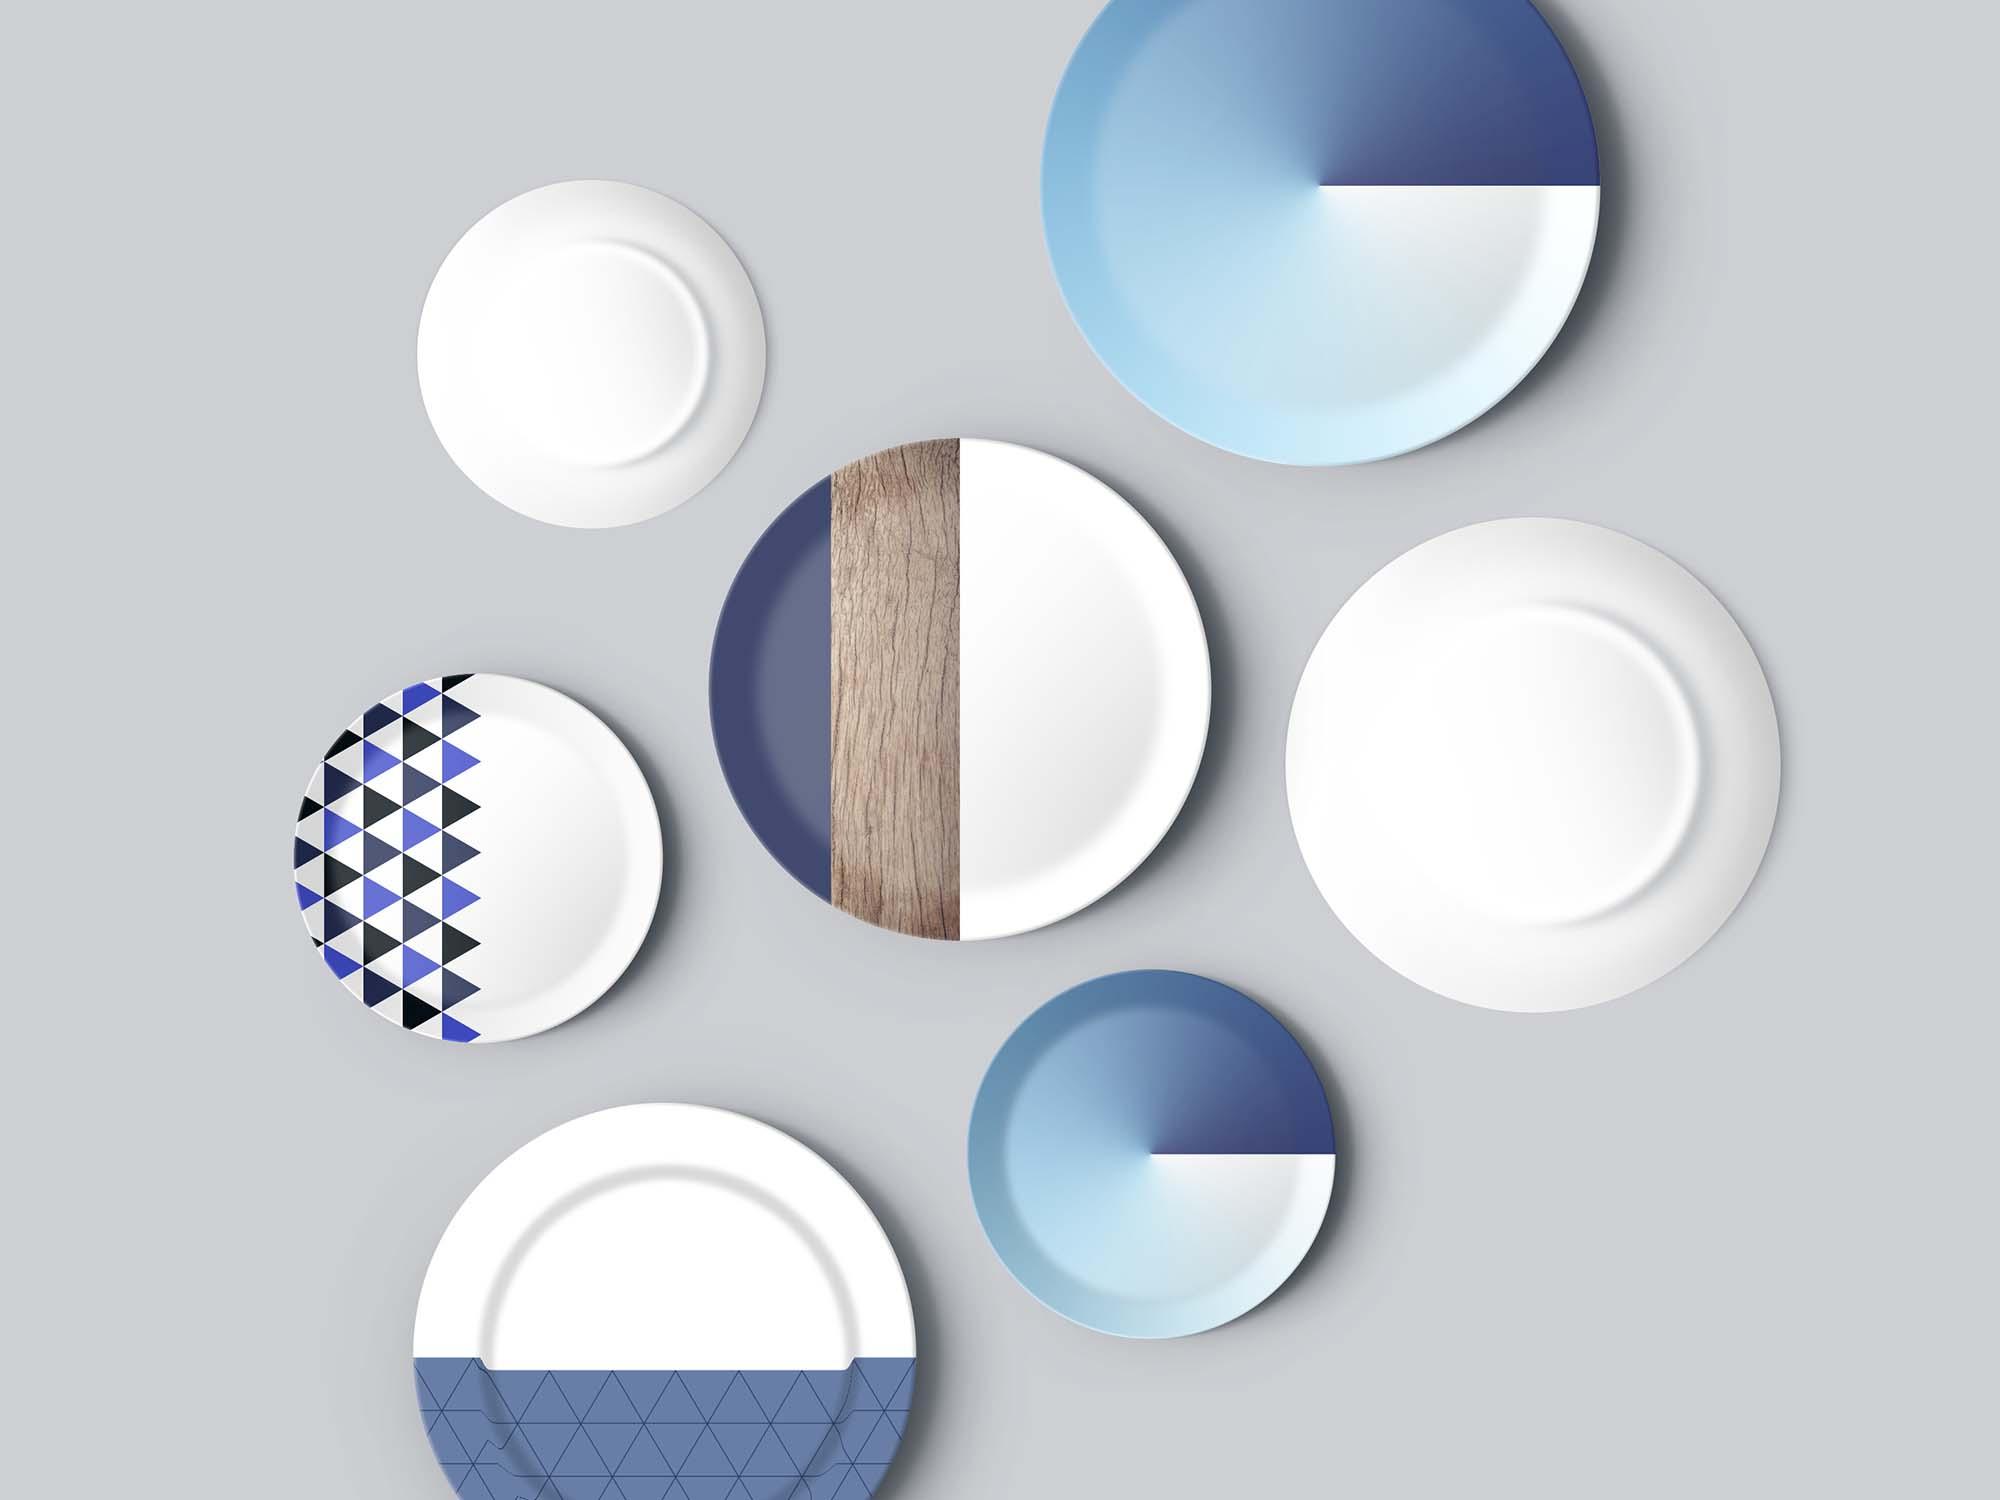 Plates Mockup